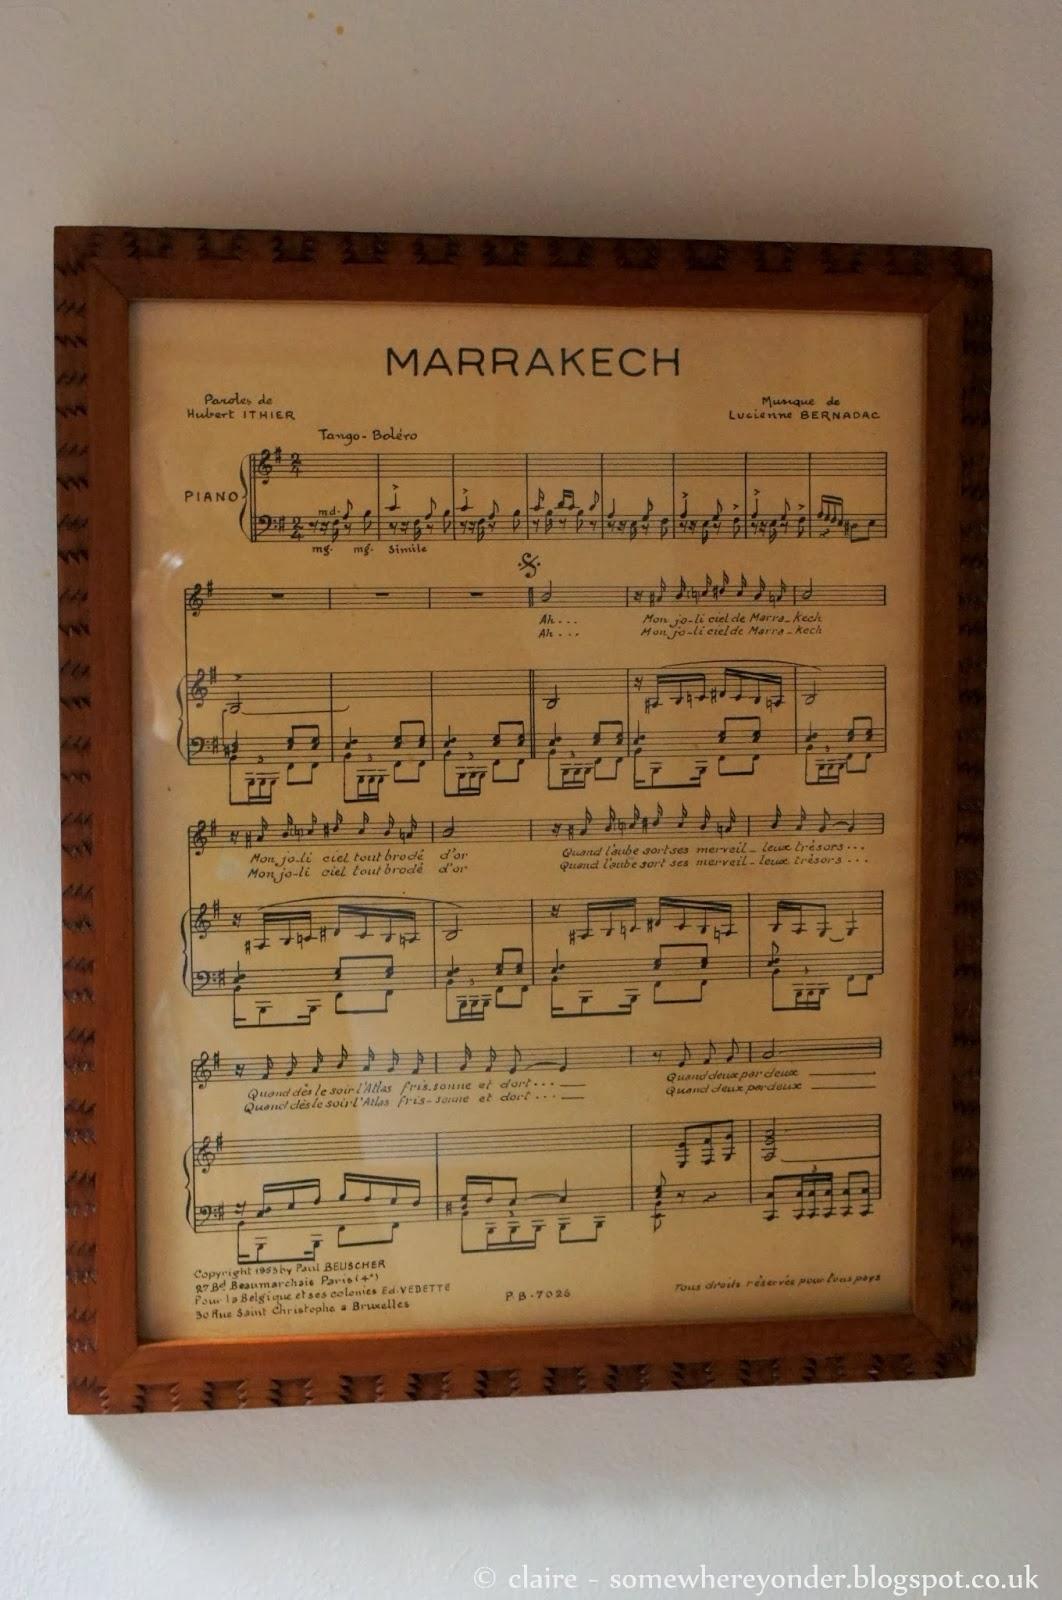 The music of Marrakech